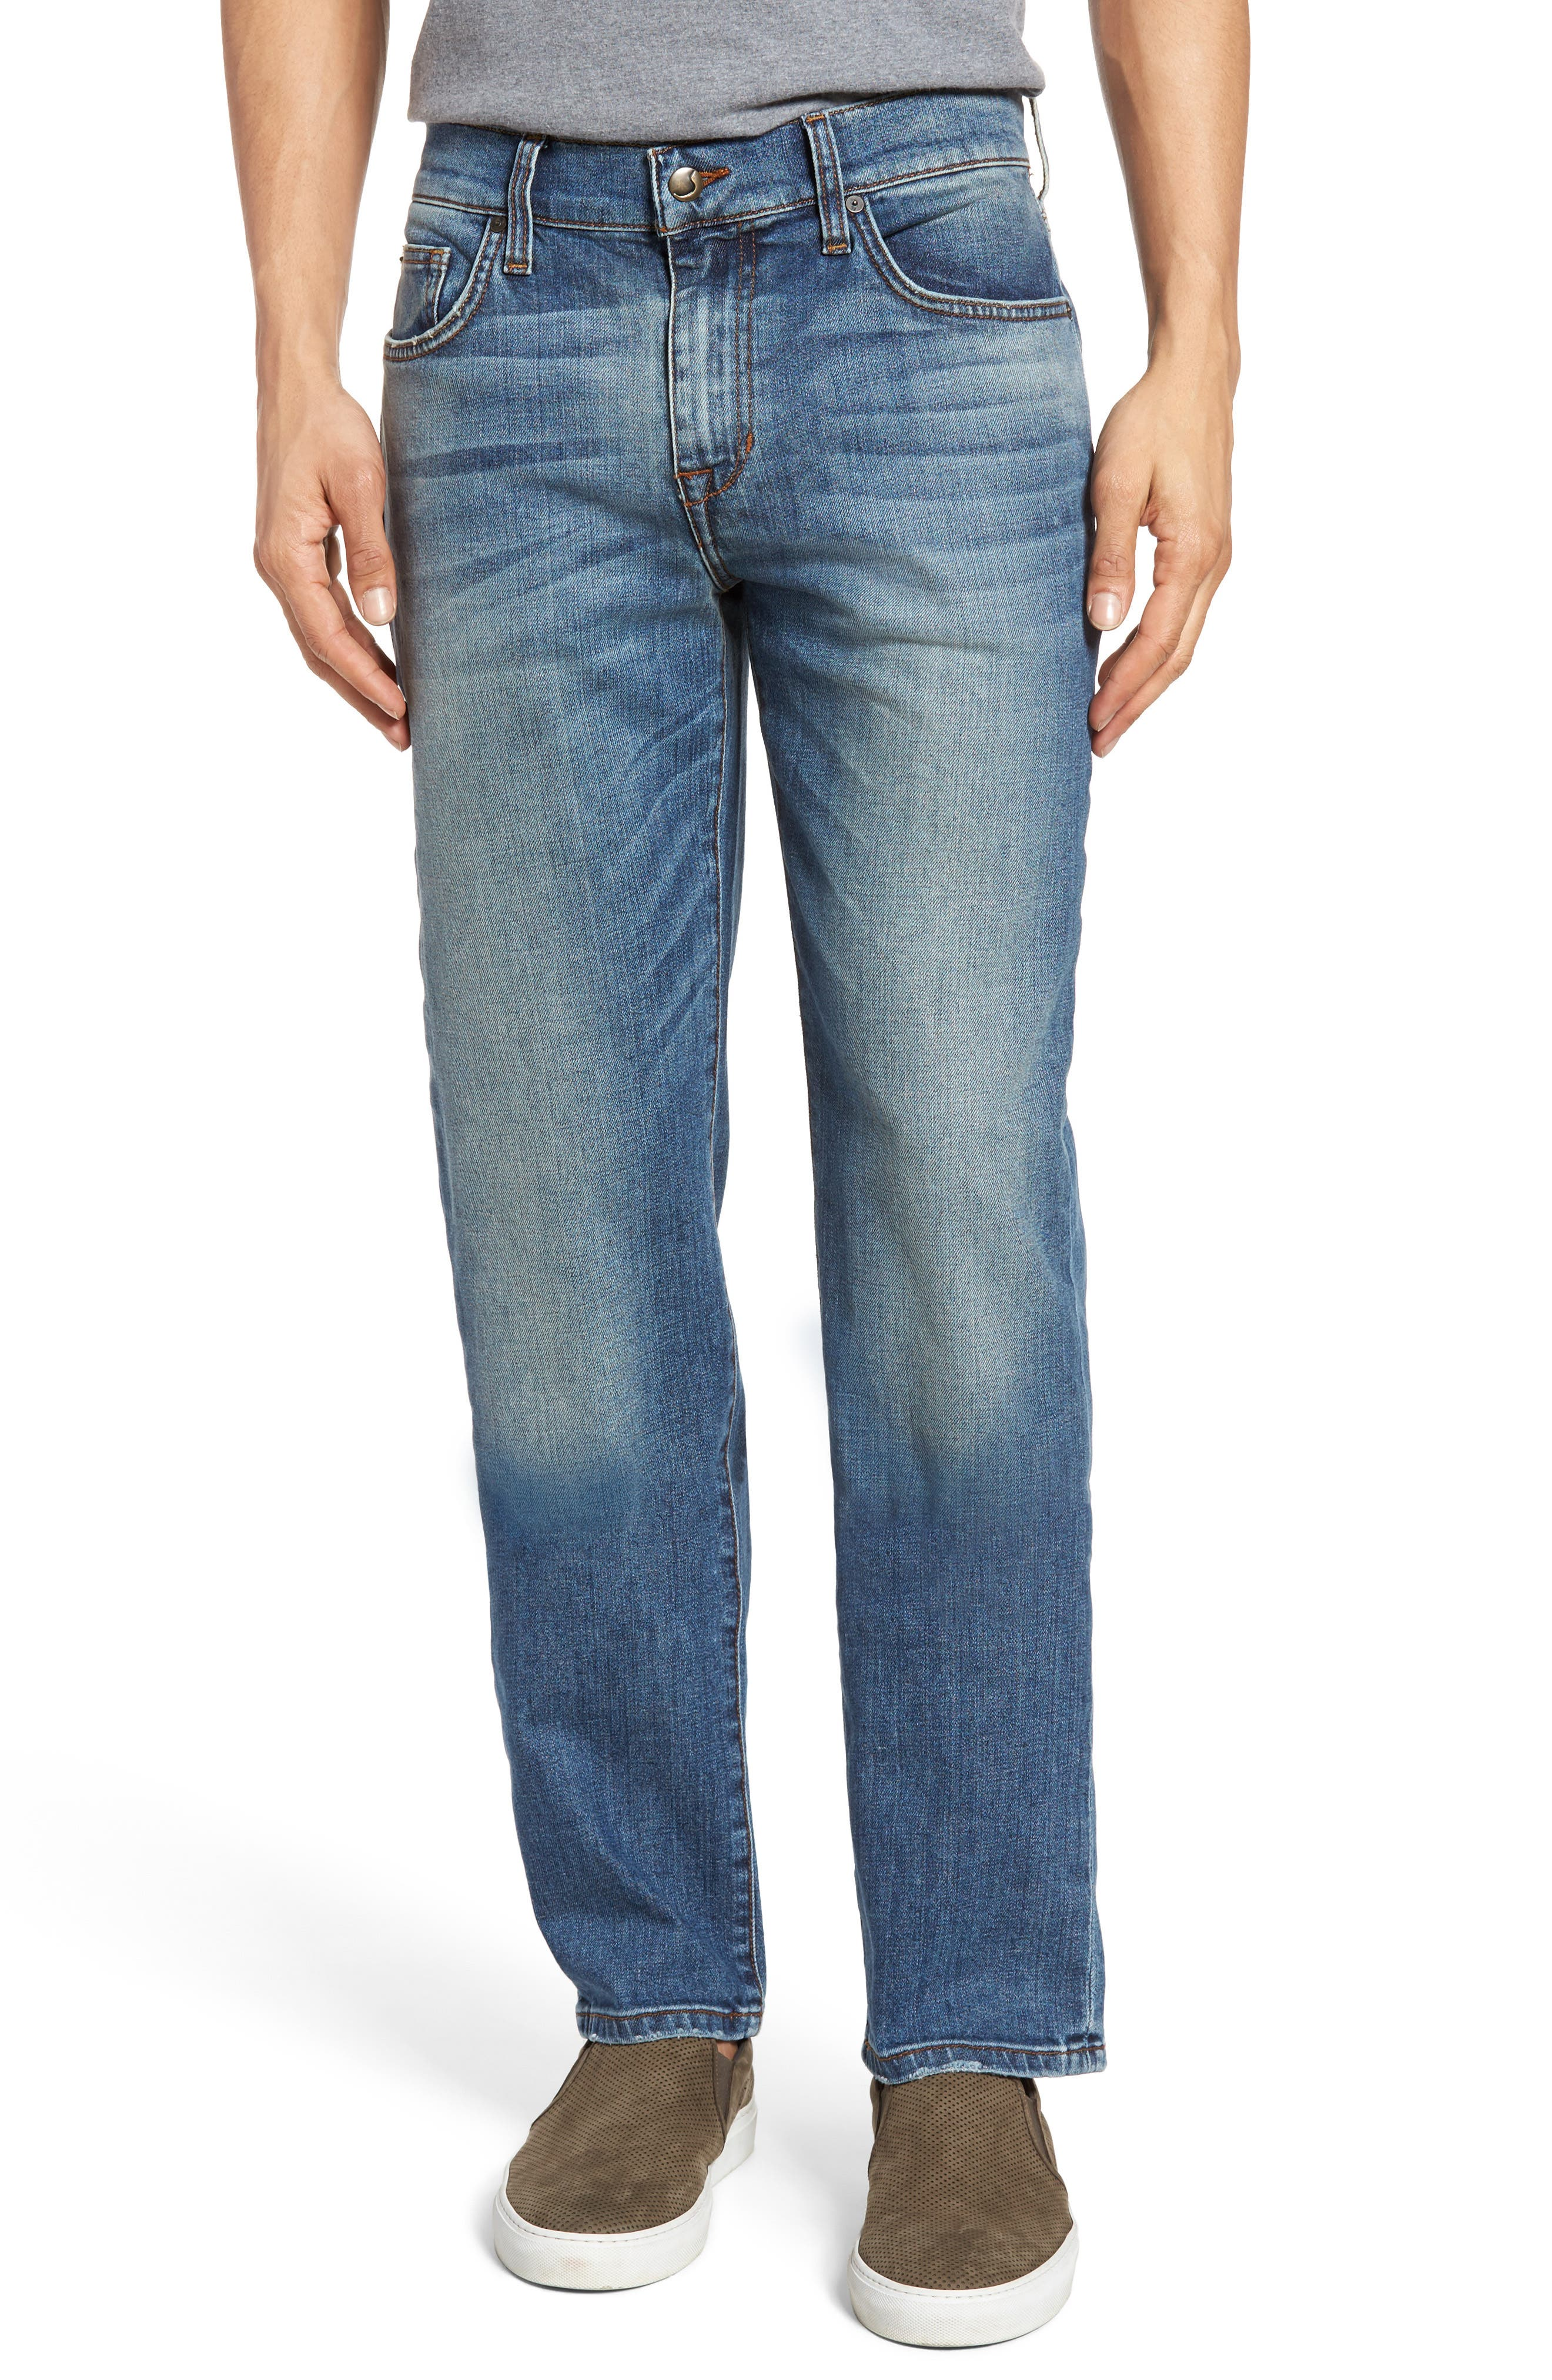 Joe S Brixton Slim Fit Jeans Andrew Nordstrom